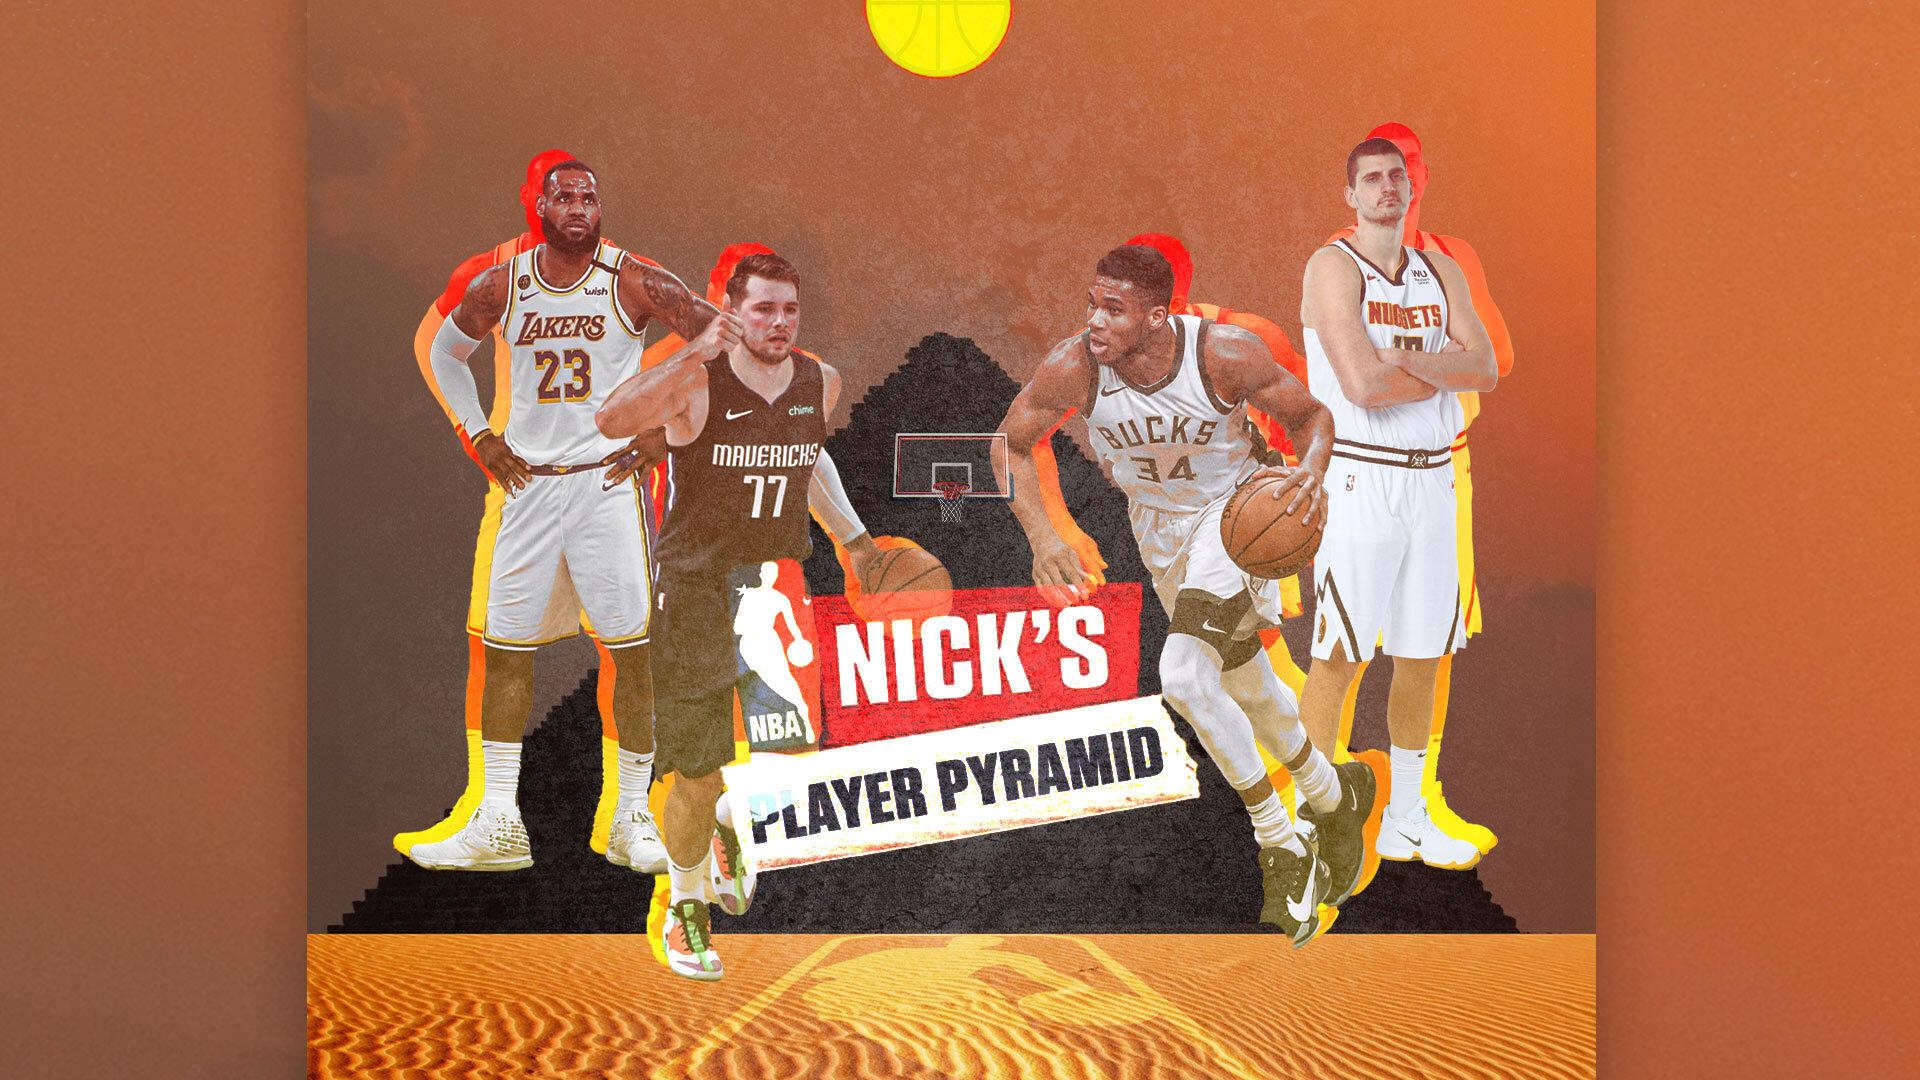 Giannis Antetokounmpo supplants LeBron James in Nick Wright's NBA player pyramid